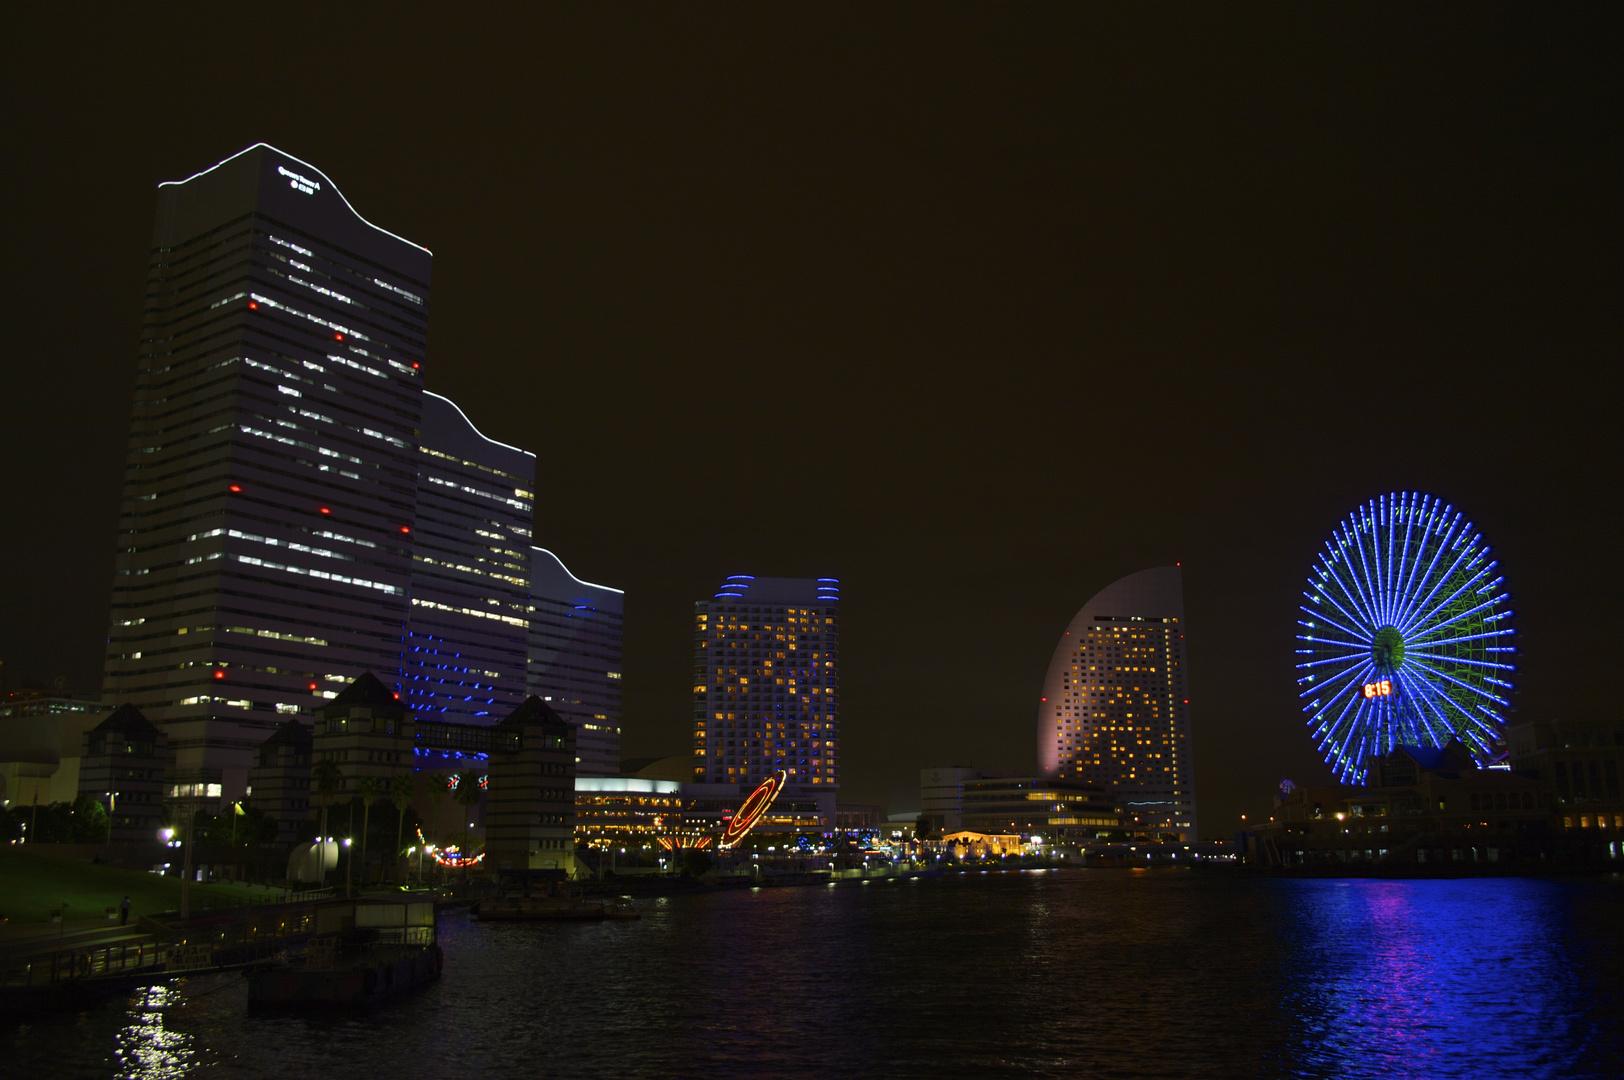 Minato Mirai - Yokohama